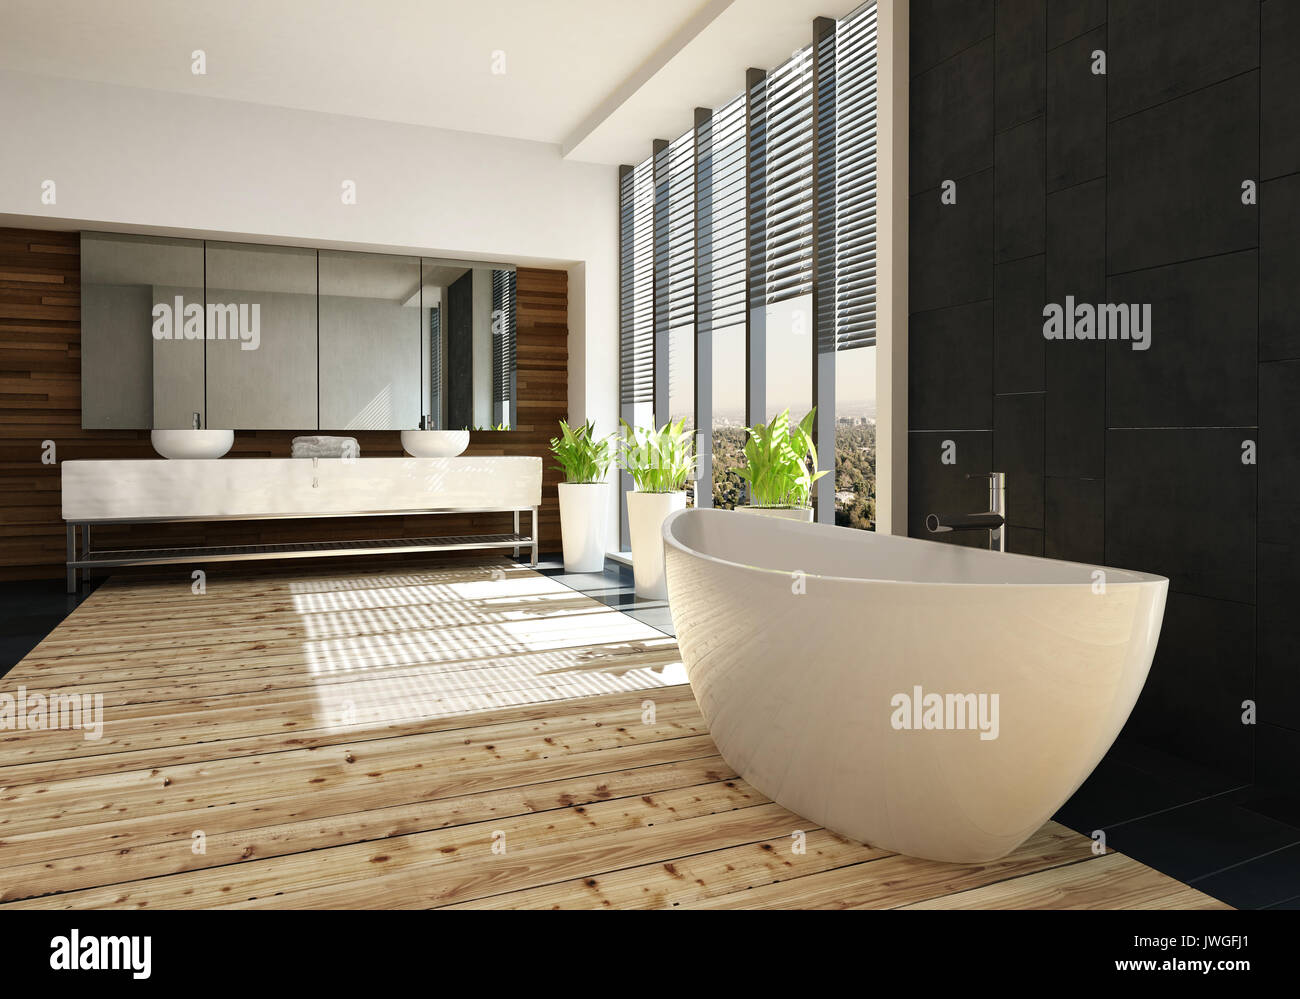 holzboden im badezimmer free dekoartikel badezimmer. Black Bedroom Furniture Sets. Home Design Ideas